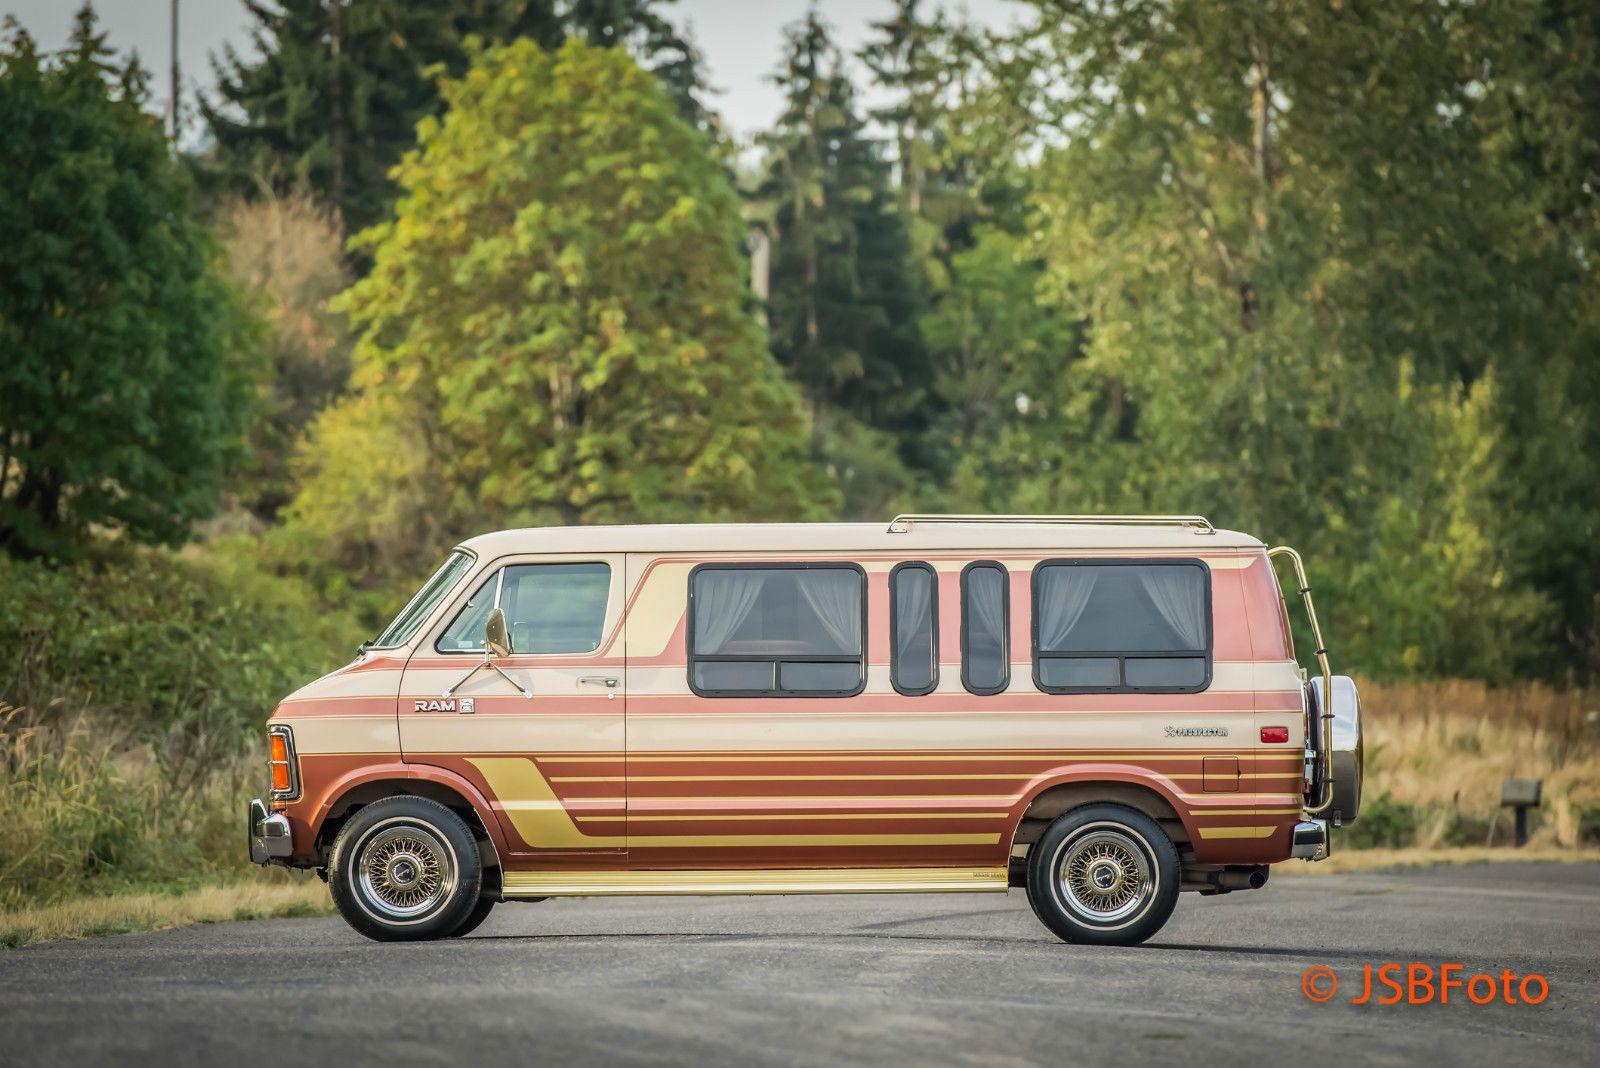 Dodge Ram Van B250 Van Fourgon Amenage Voiture Fourgon